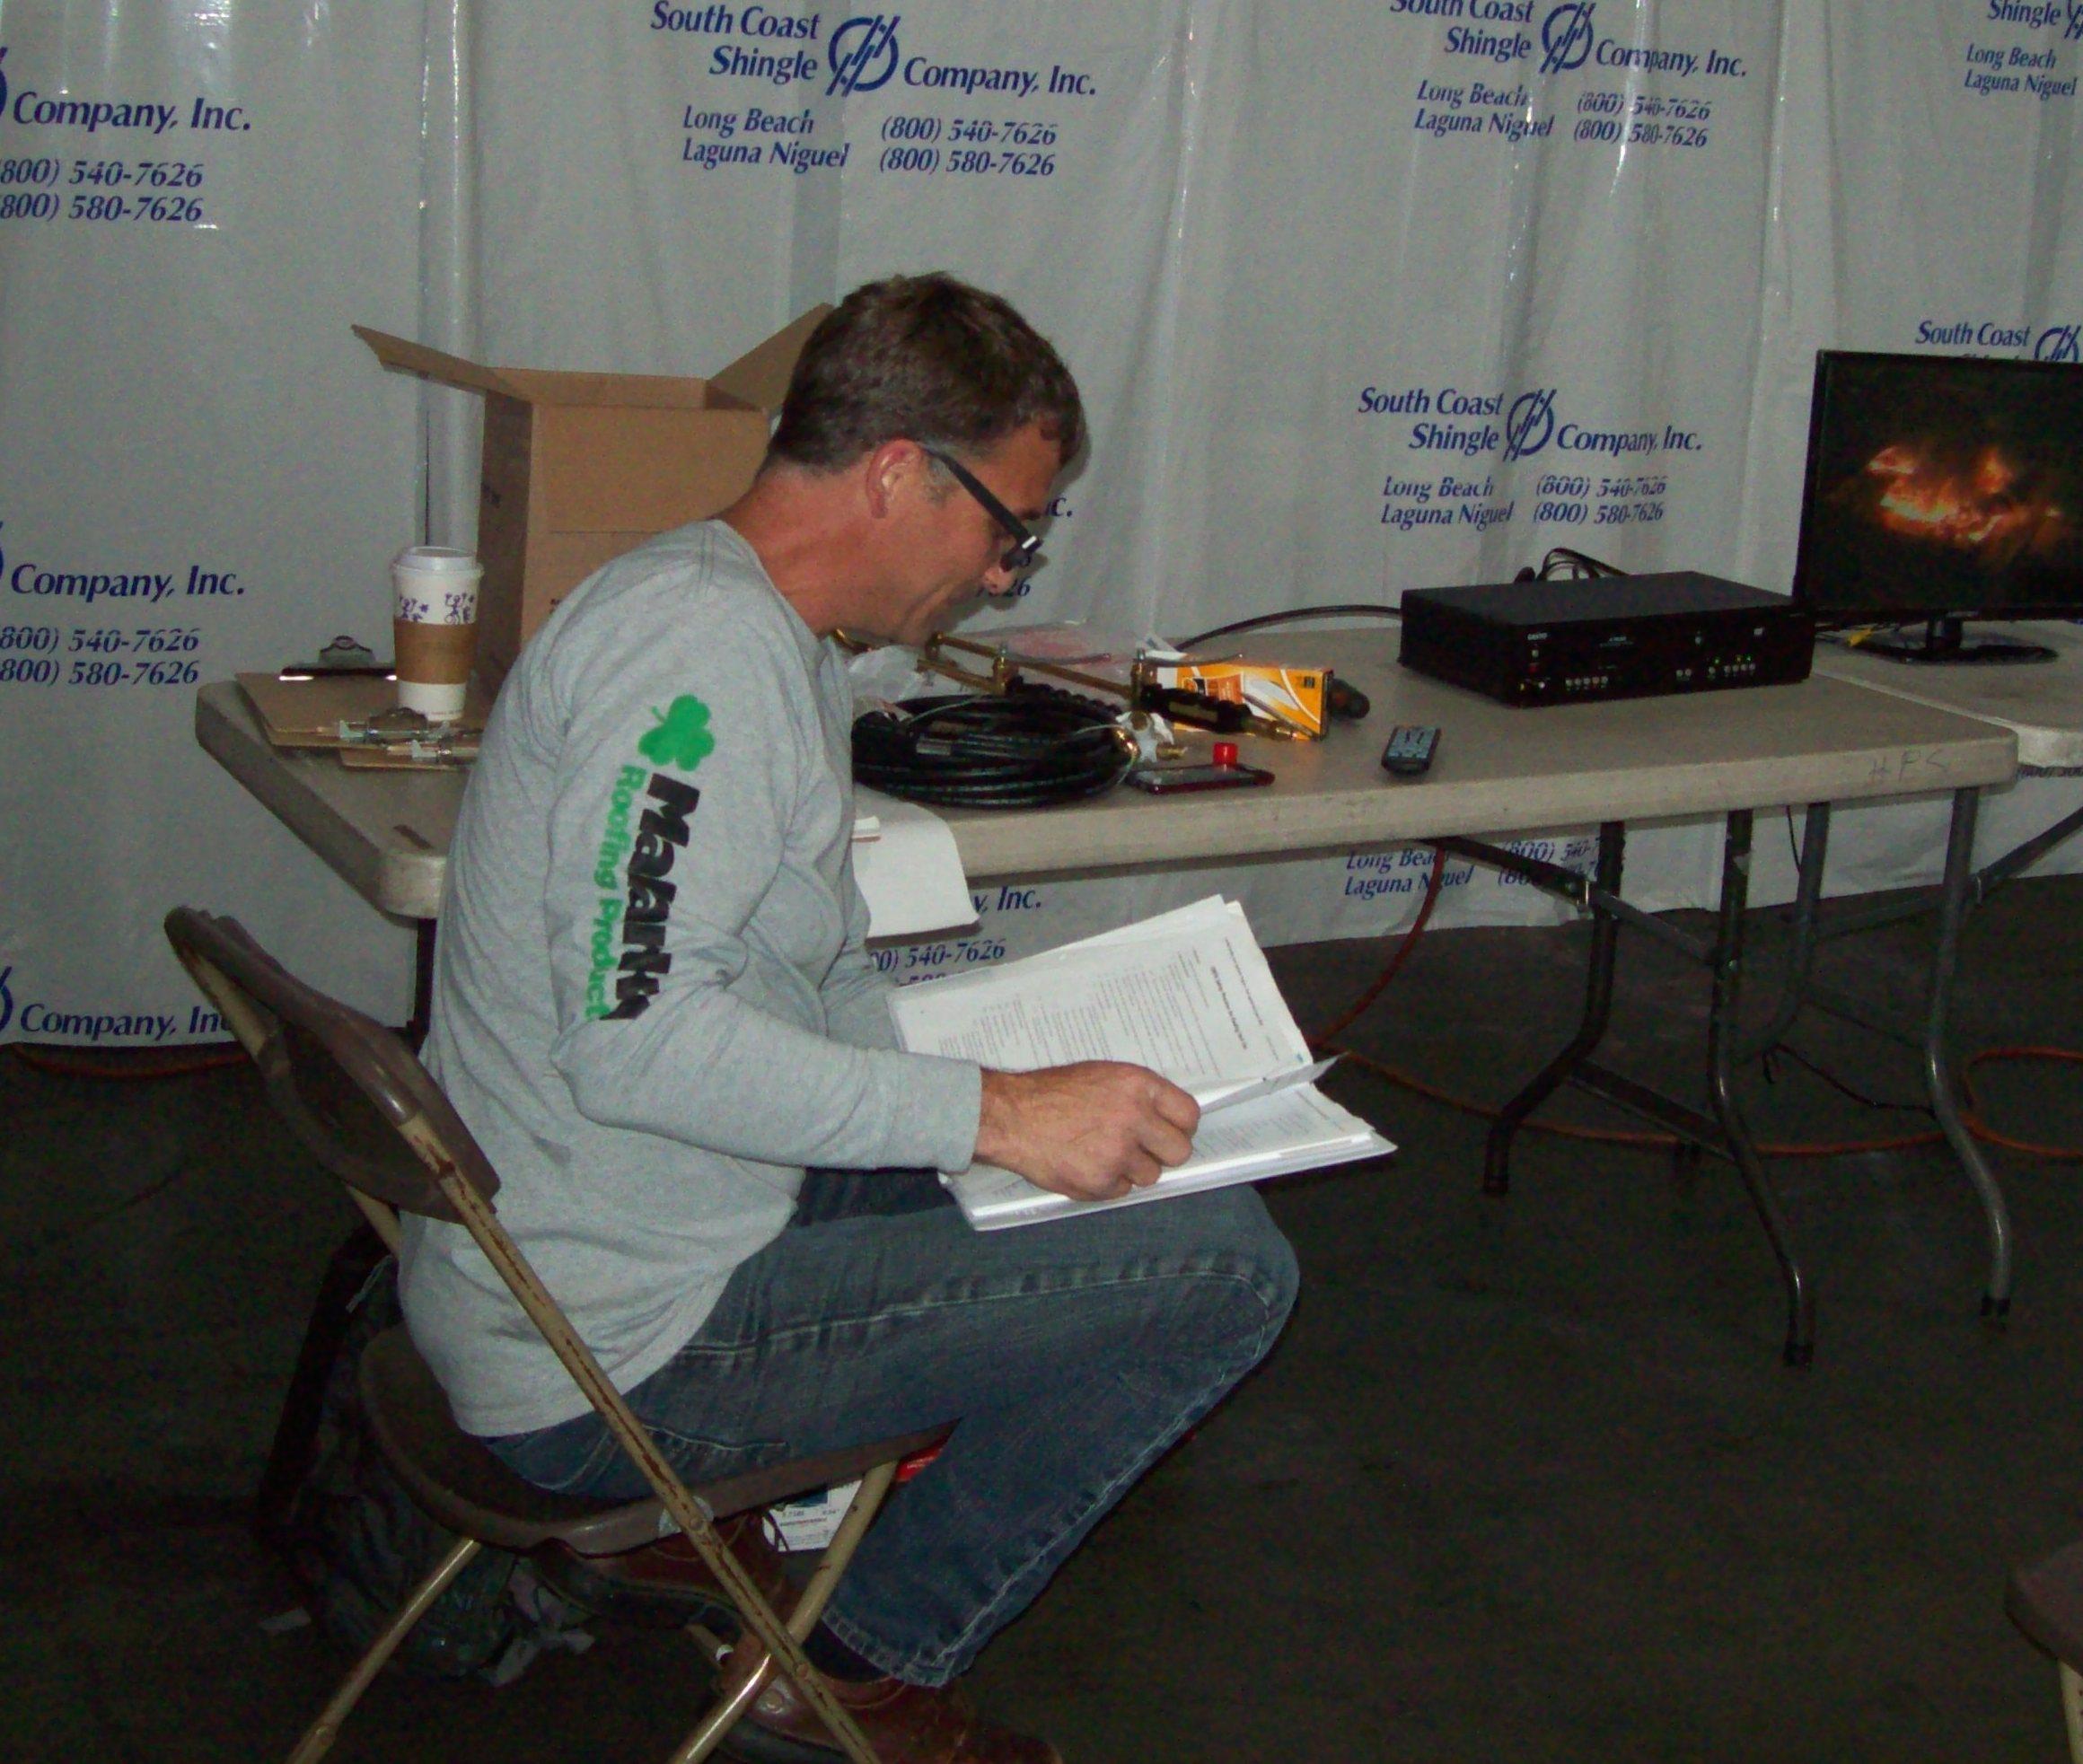 Roofing Contractors Association of California